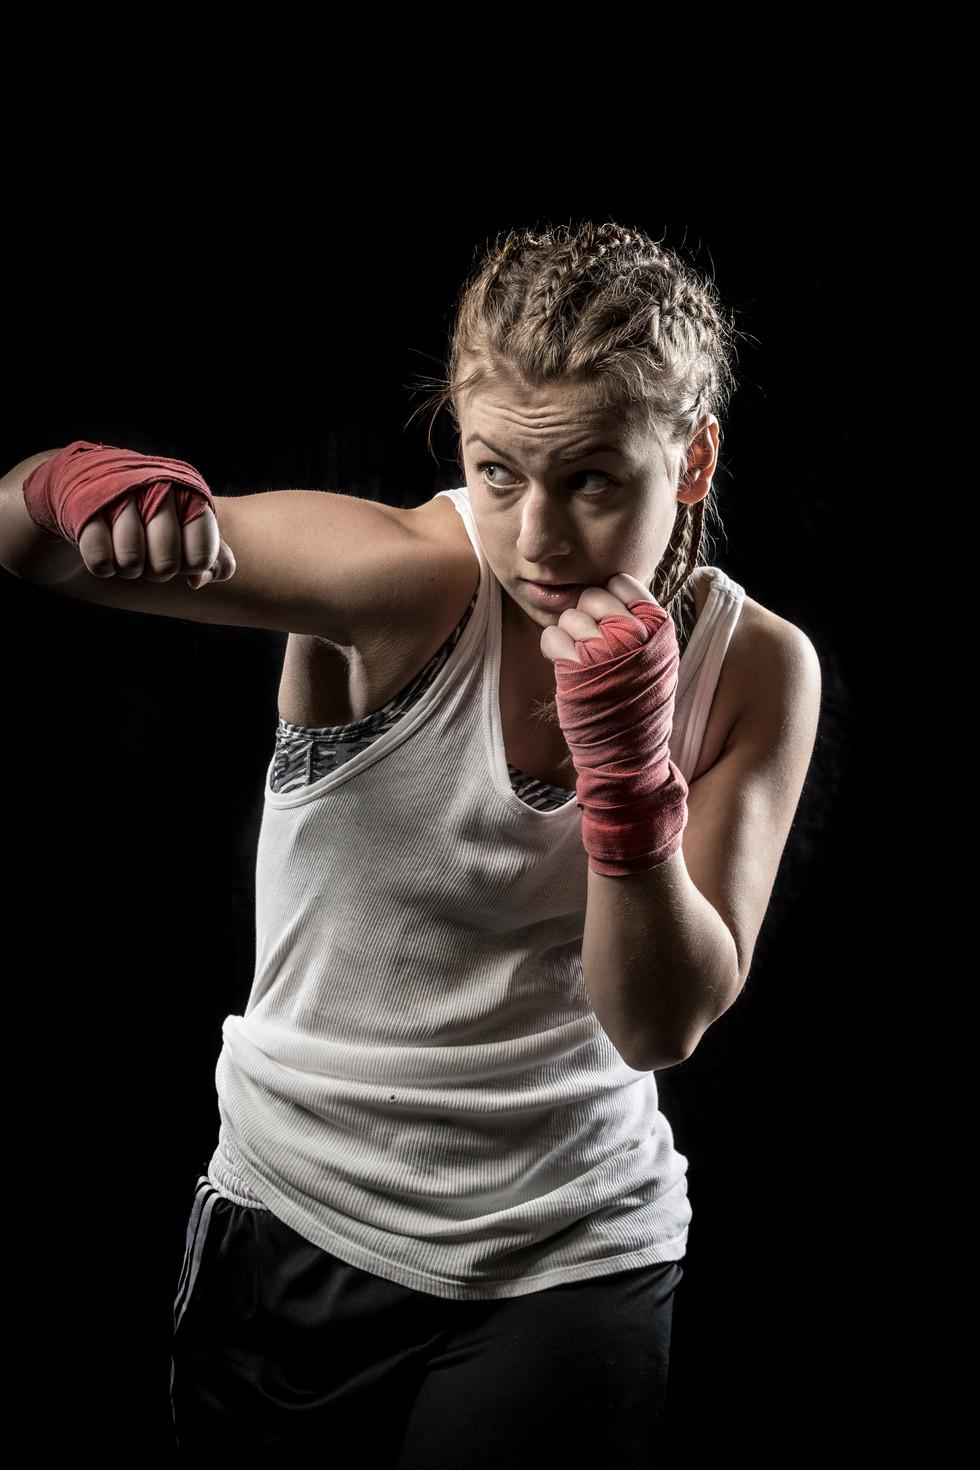 Sportfotografie-Boxen-Boxerin-10.jpg